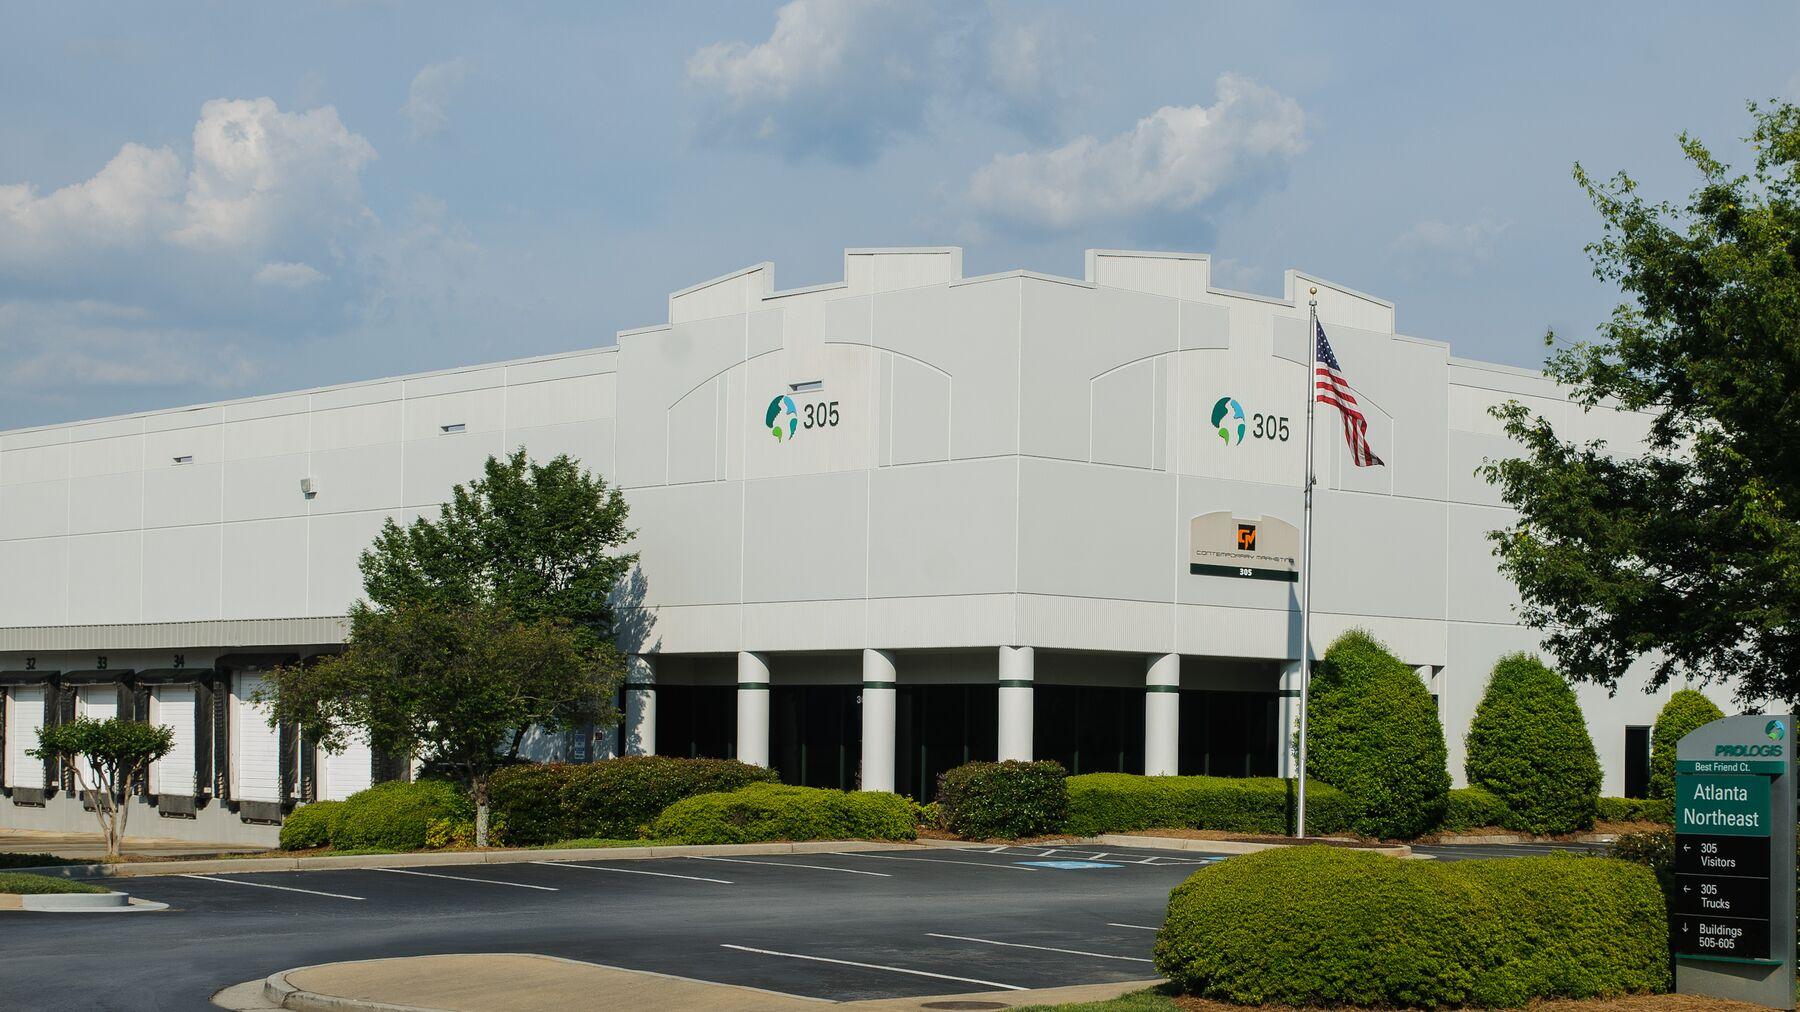 DPM-Atlanta-Northeast-4-2.jpg